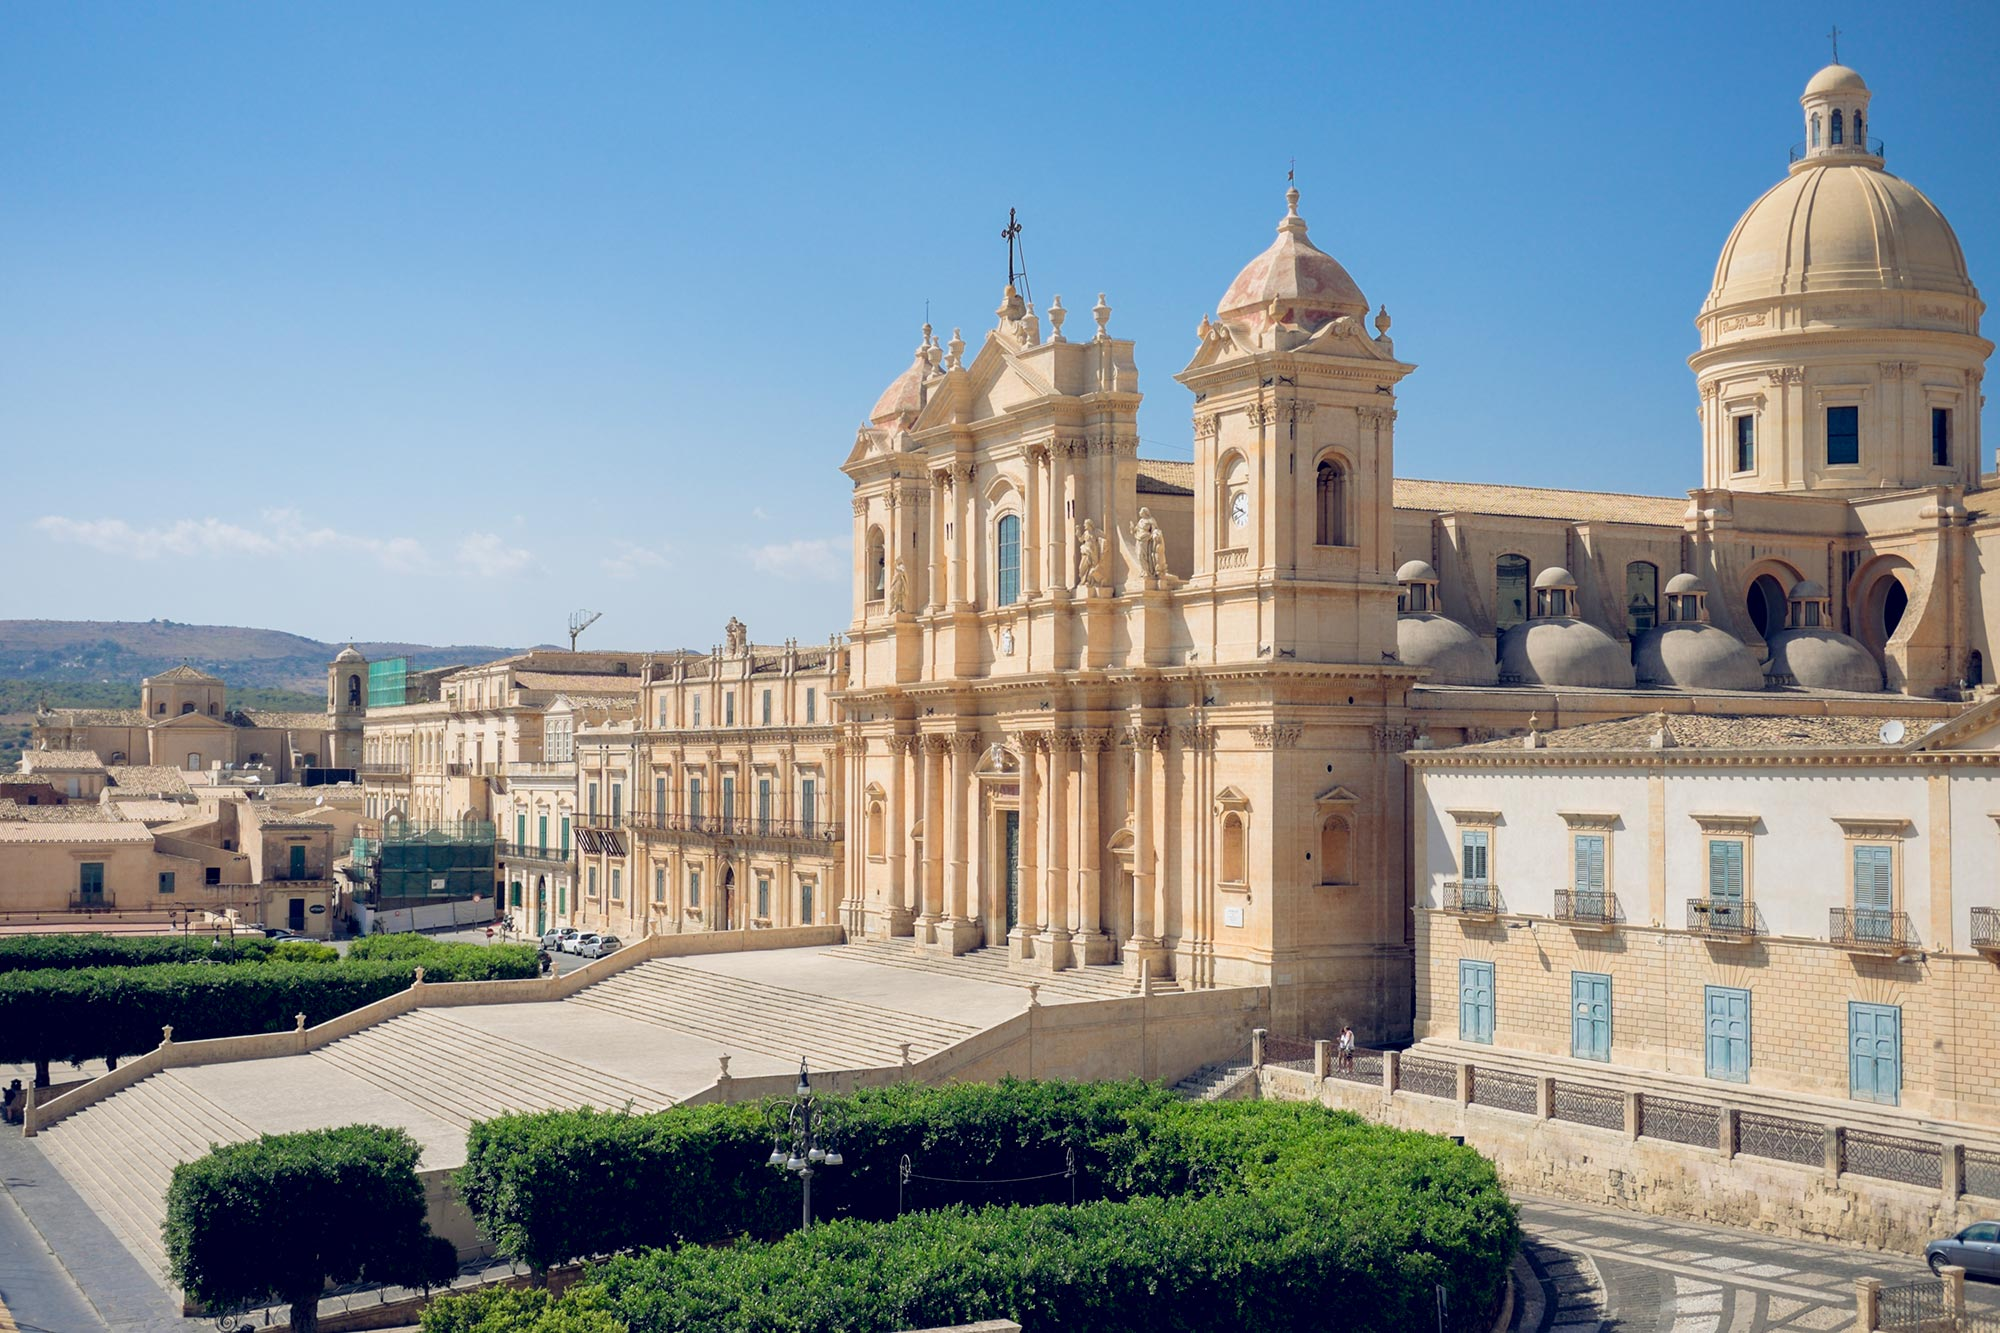 italy-sicilia-noto-chiesa-santa-chiara-view1